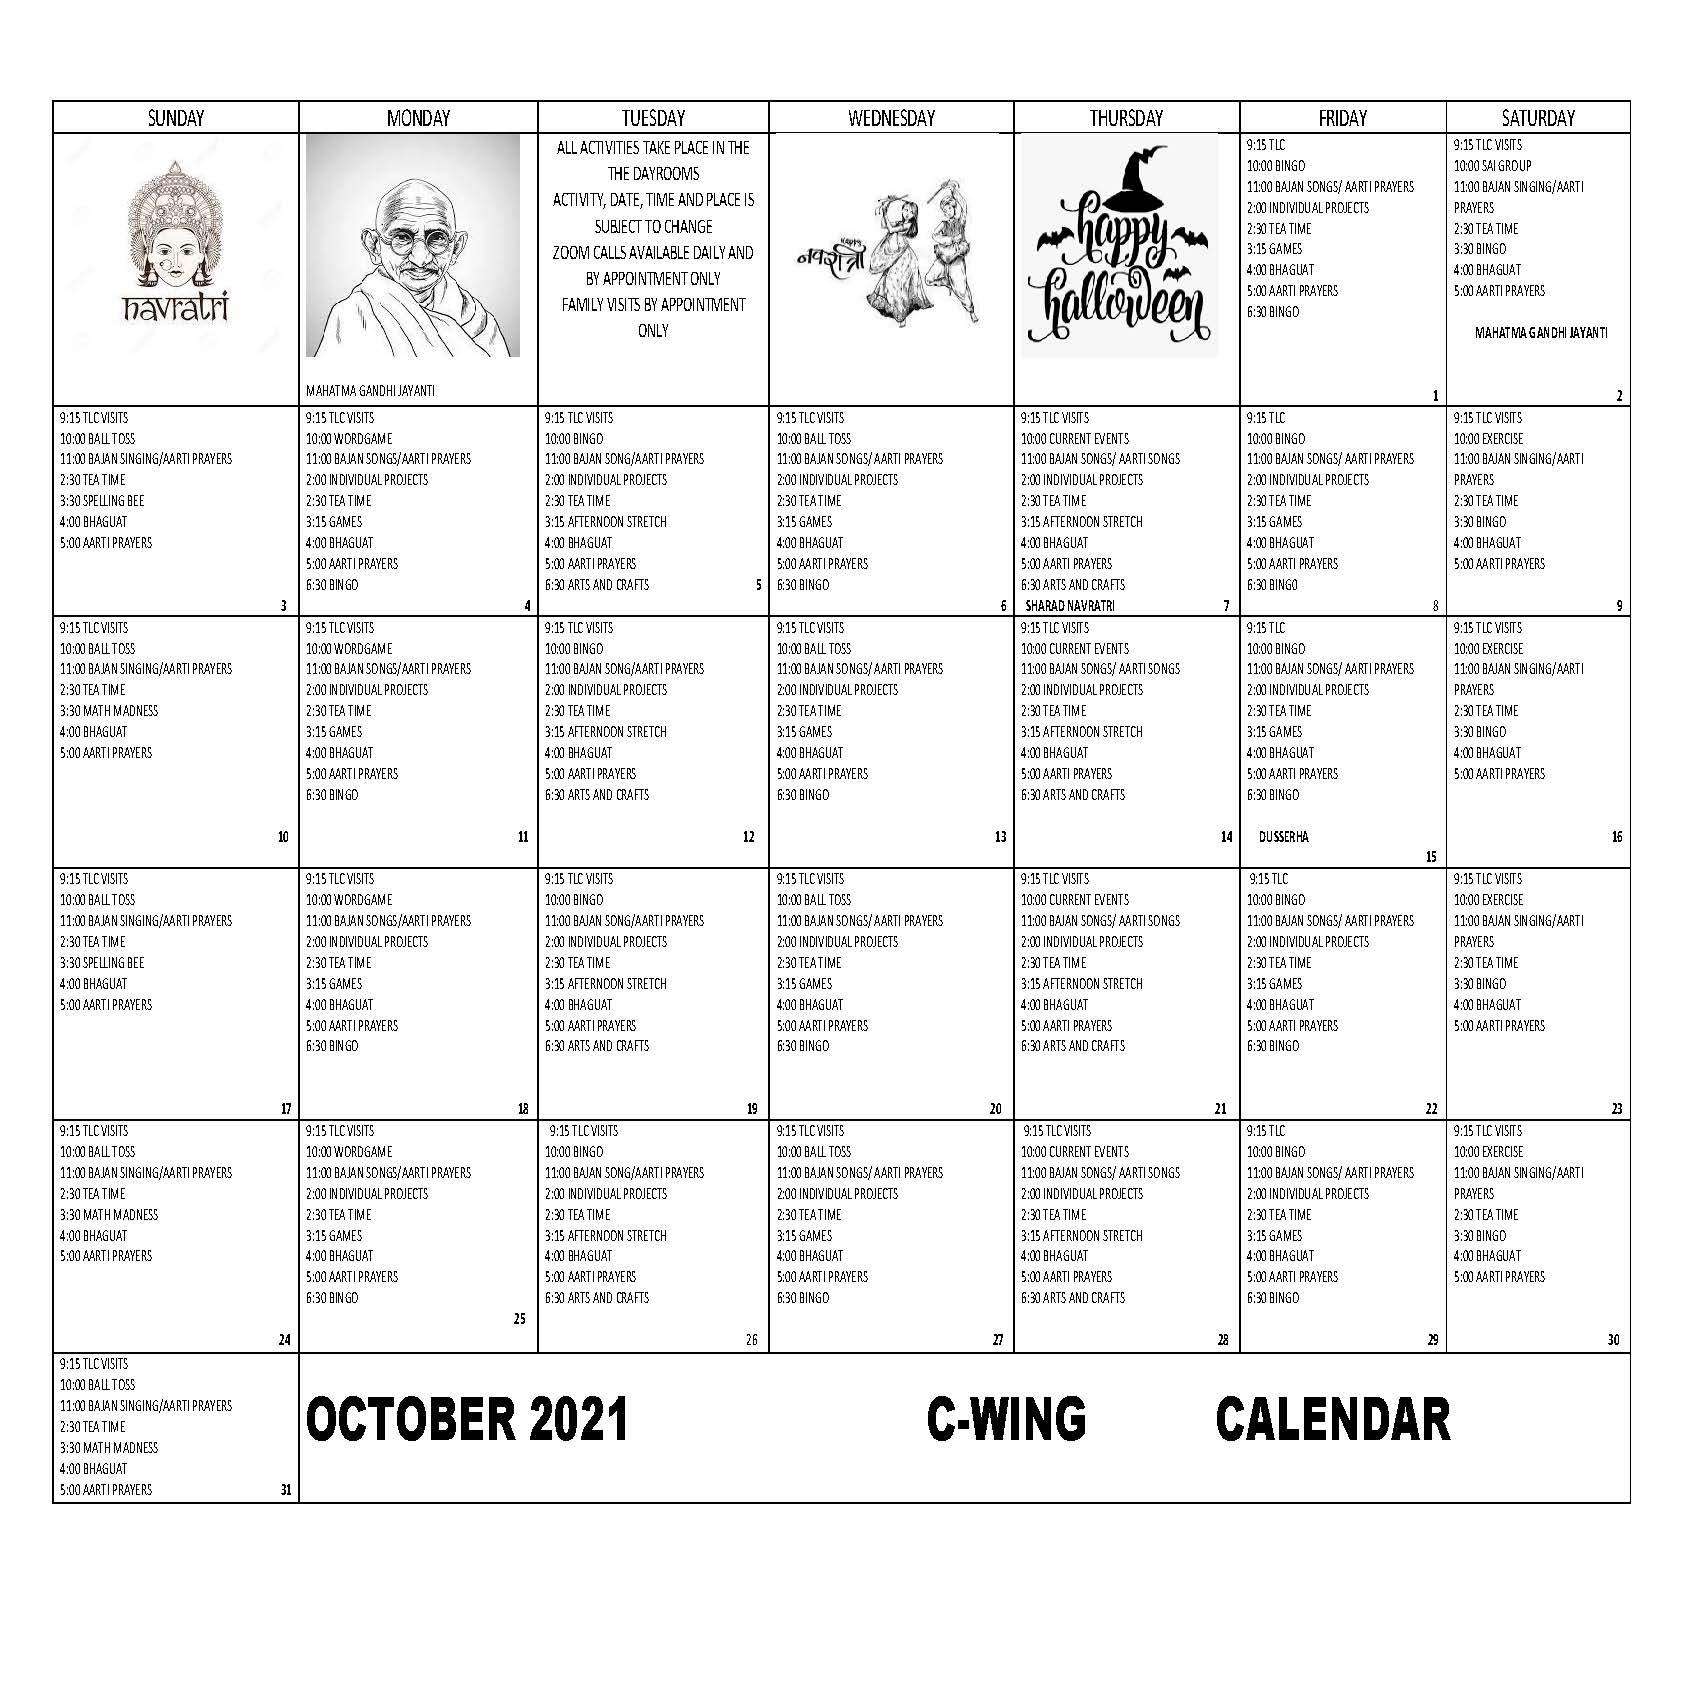 Arnold Walter C-Wing October 2021 Event Calendar